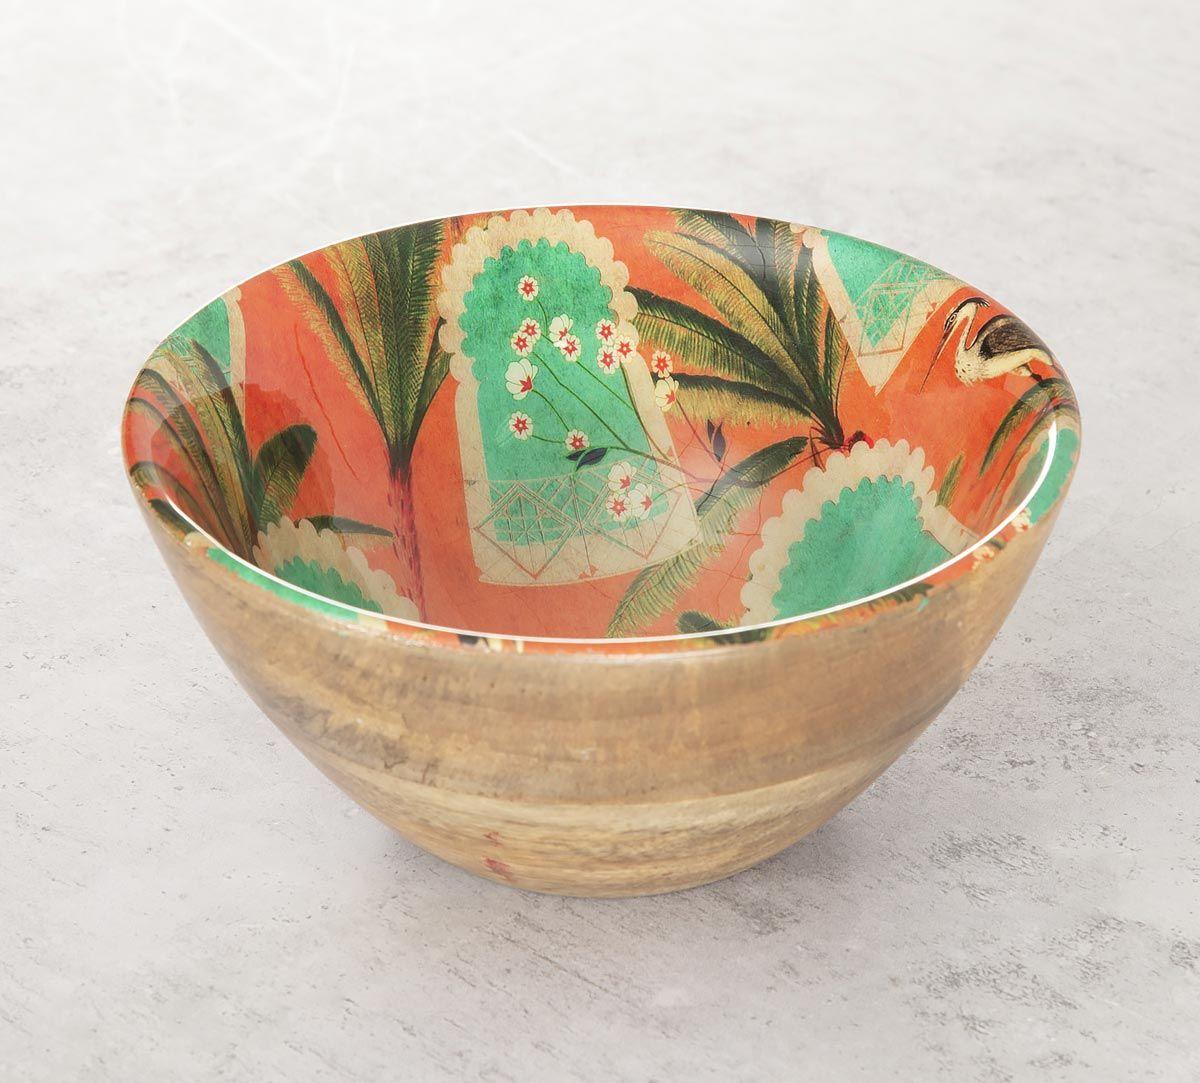 India Circus Heron's Palace Wooden Bowl